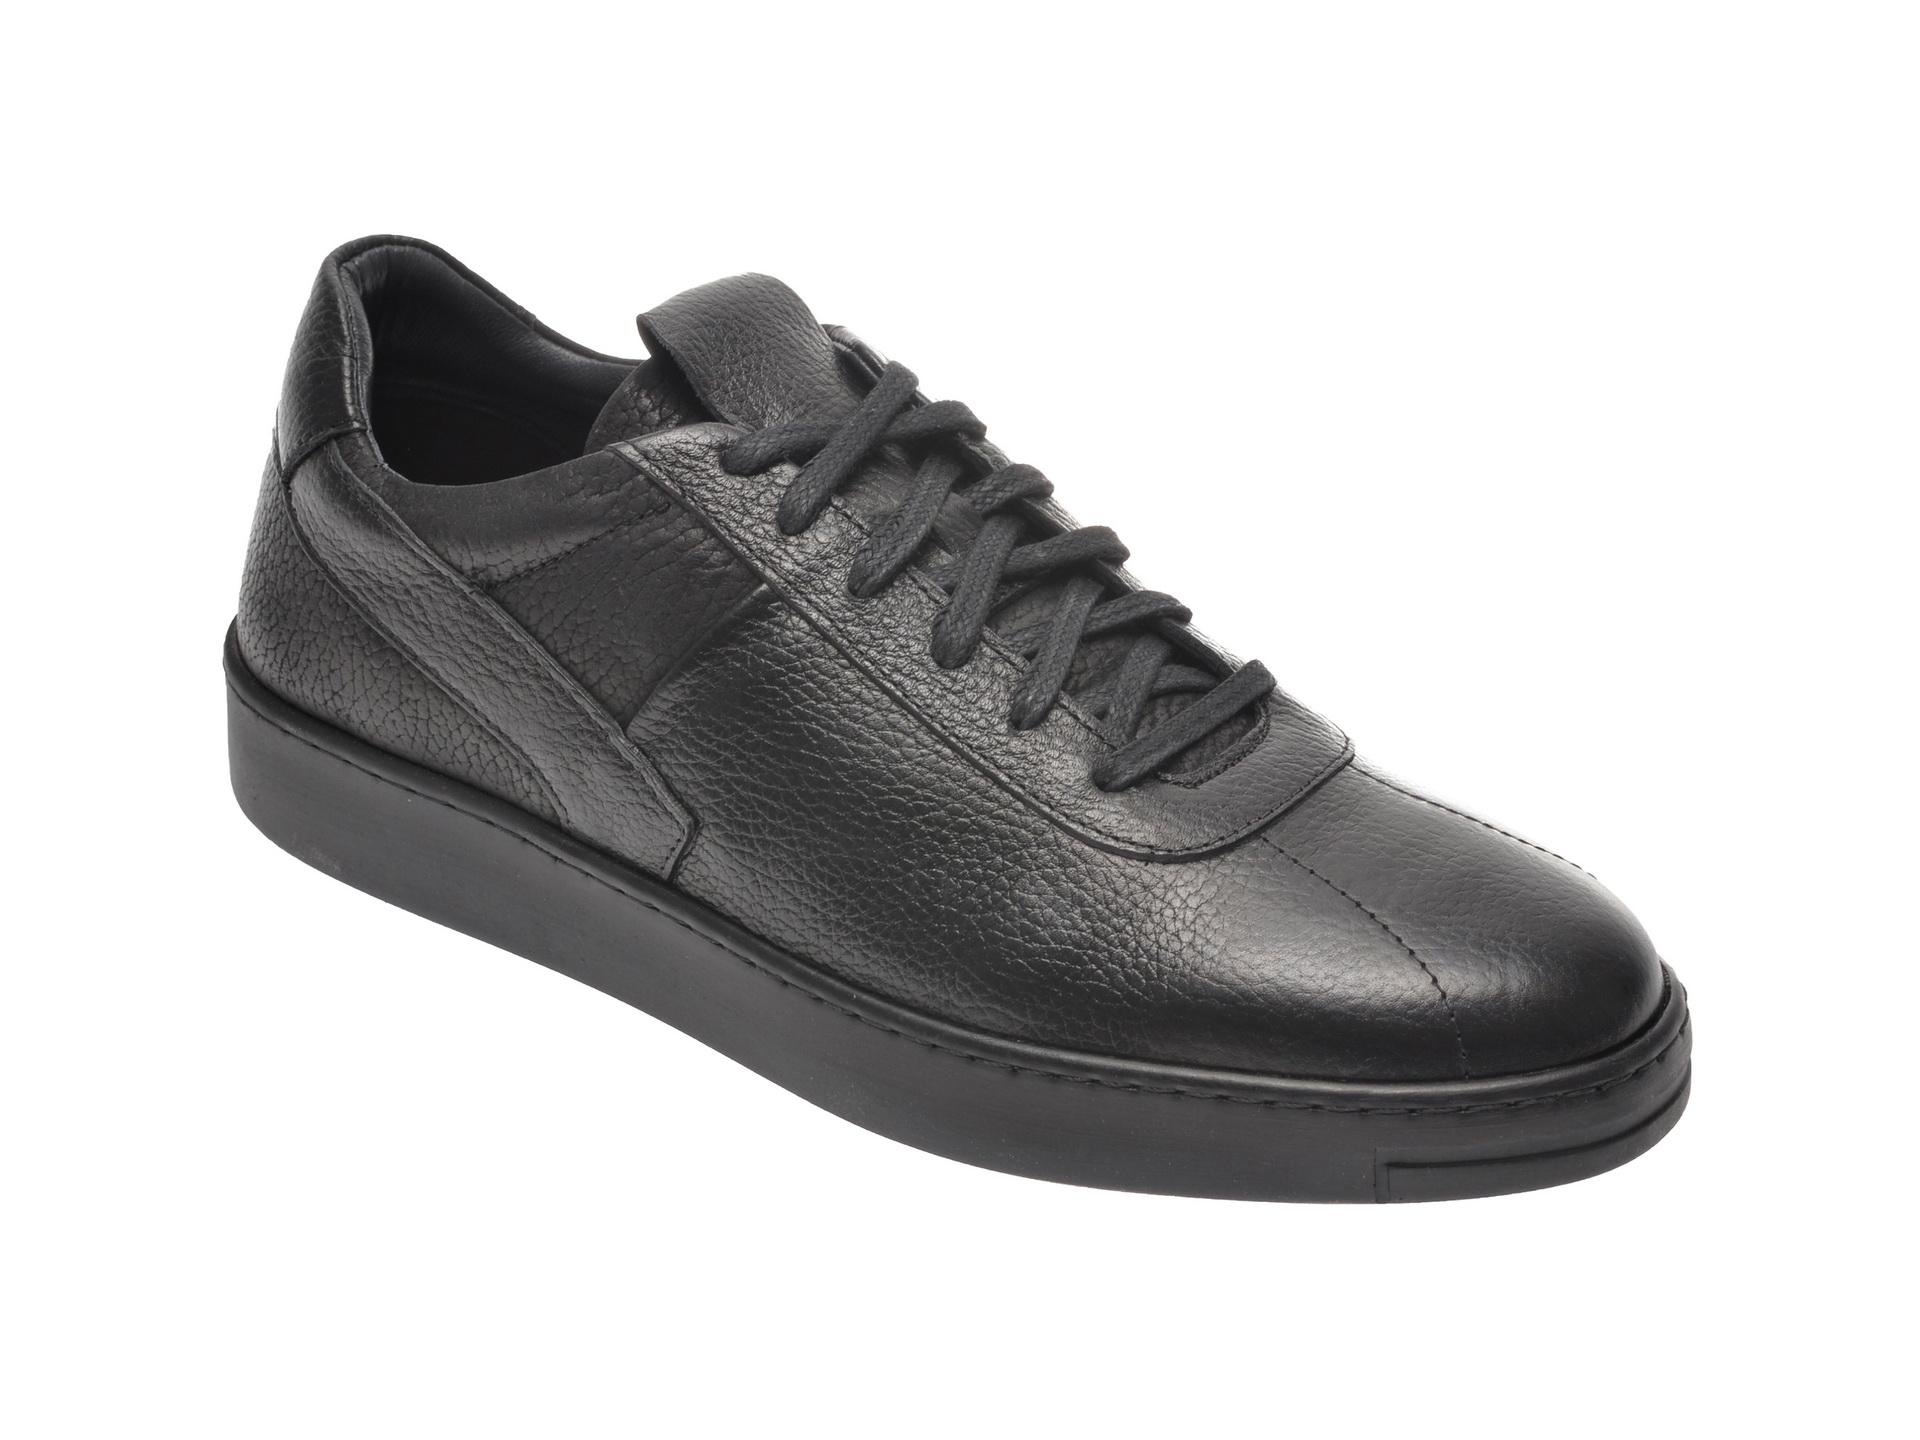 Pantofi OTTER negri, M403, din piele naturala imagine